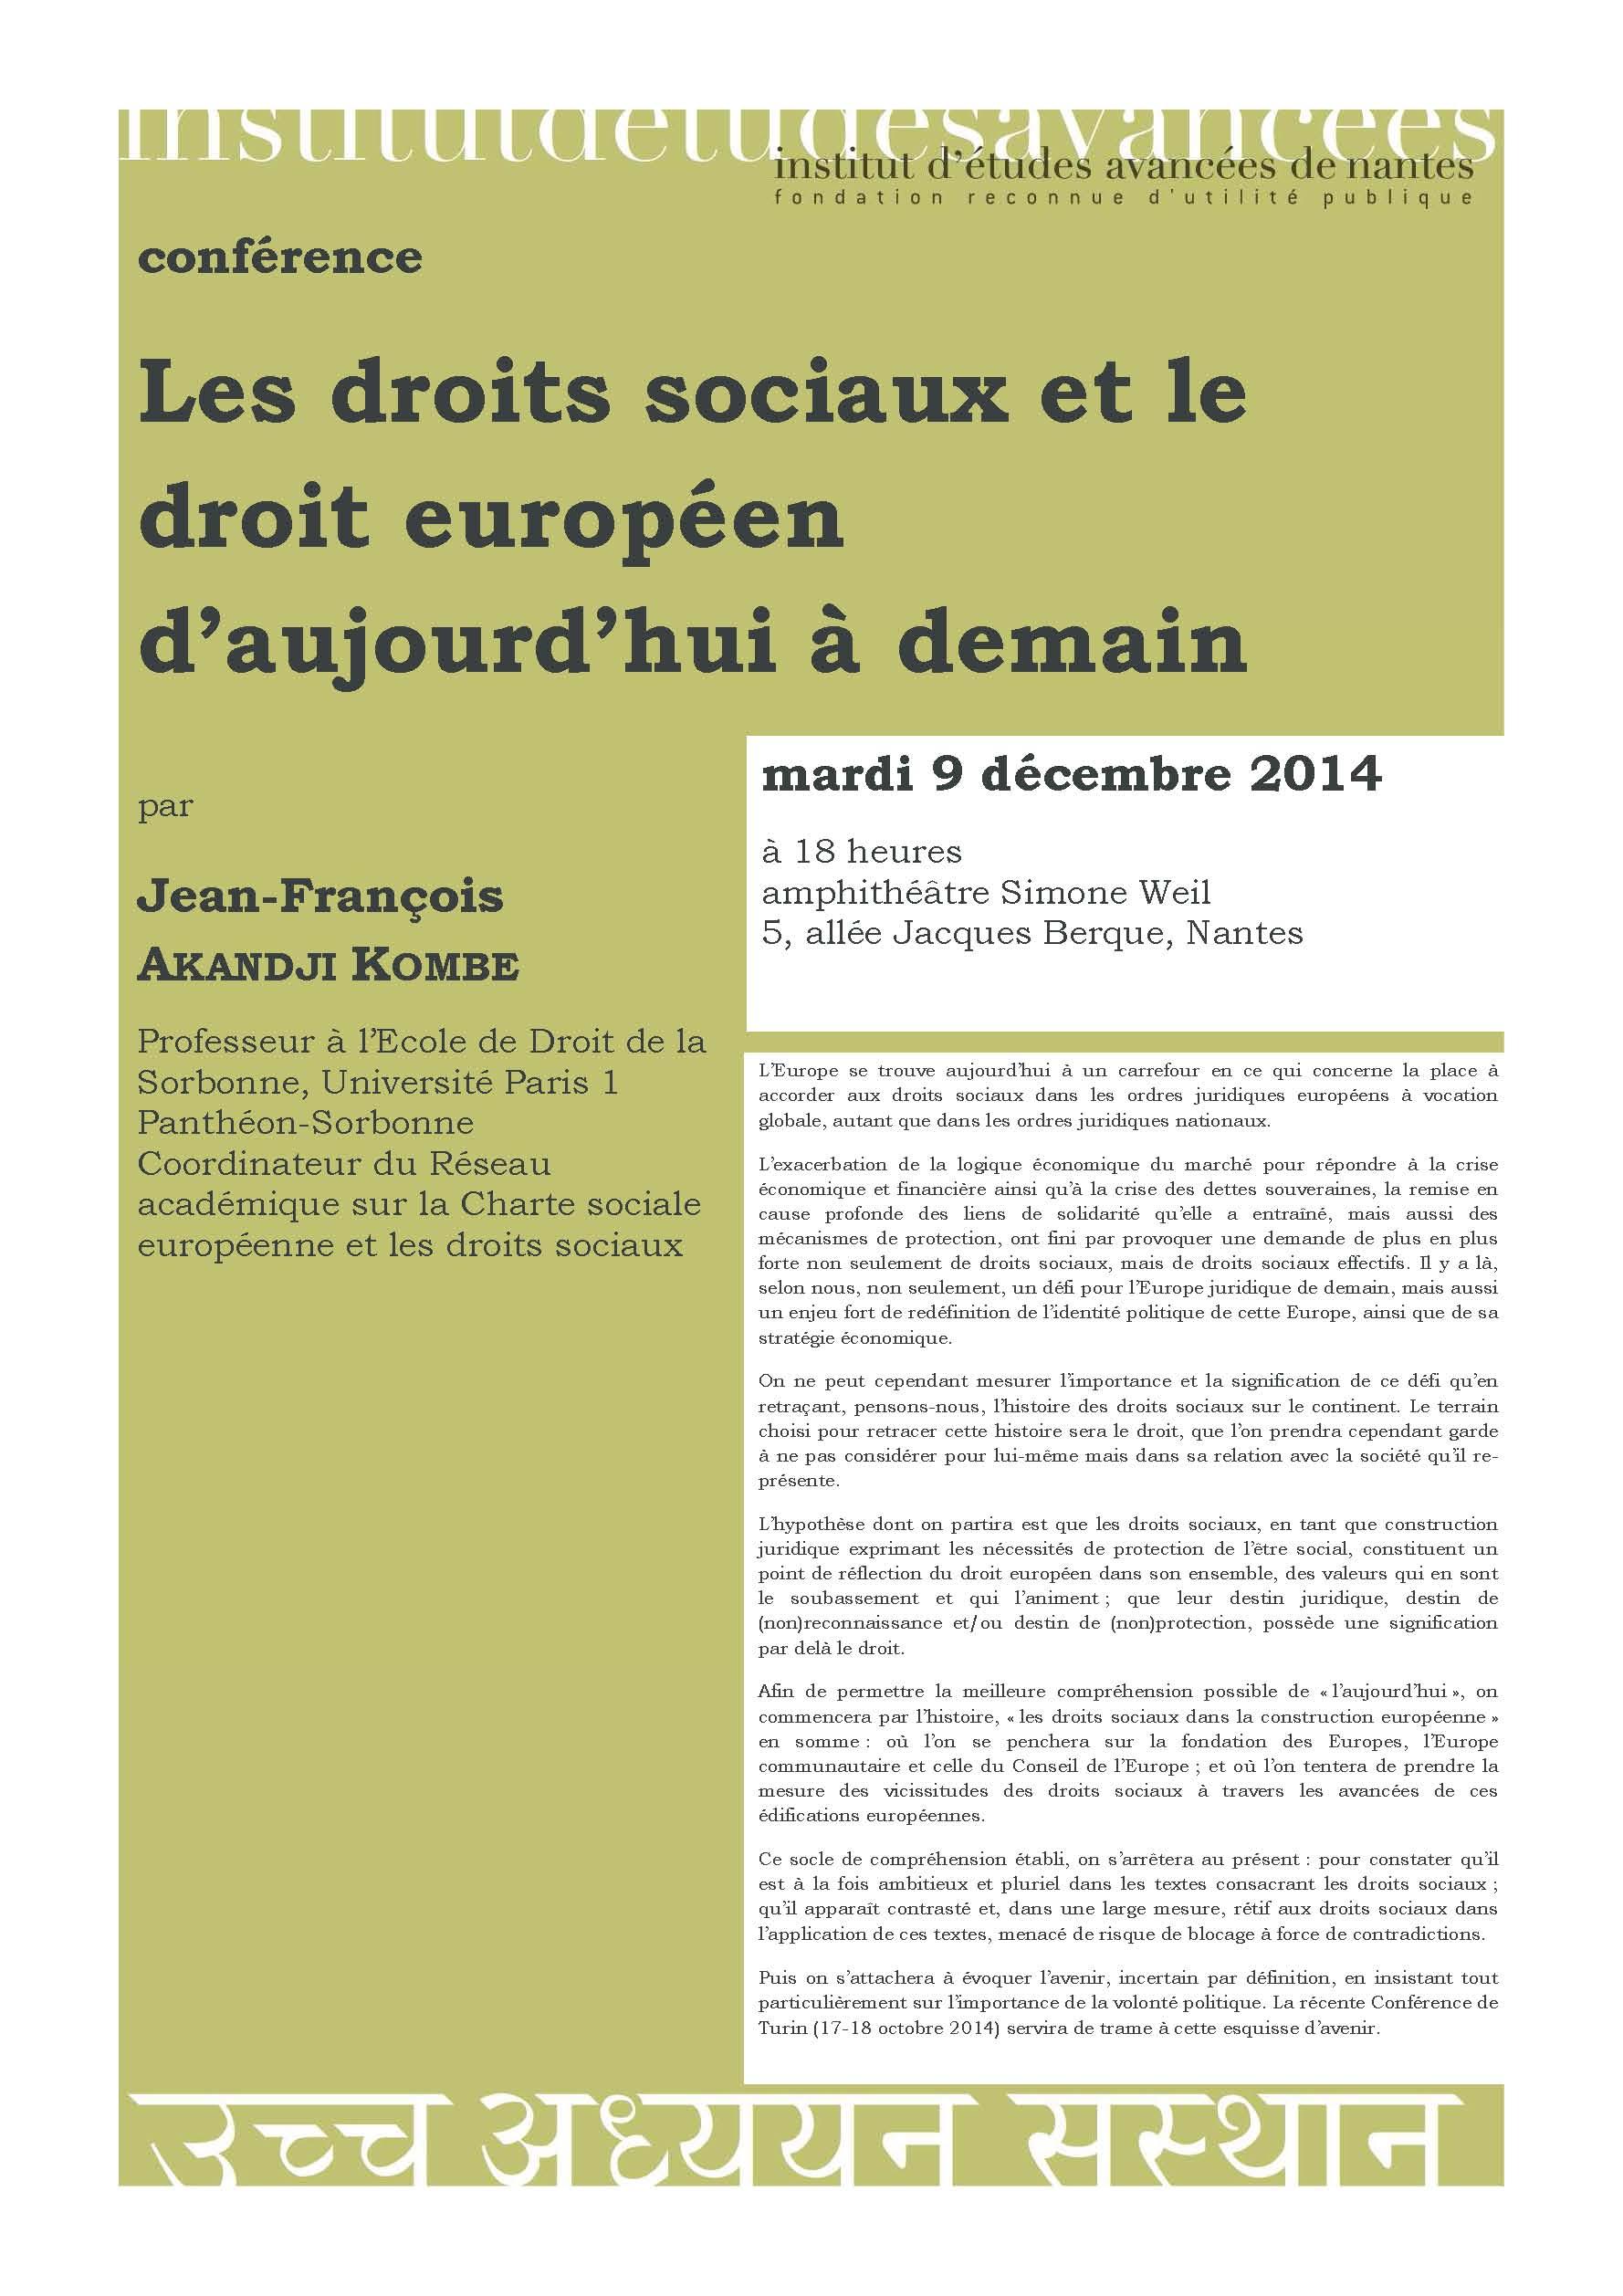 IEA-Nantes-affiche-de-la-conference-du-prof-akandji-kombe